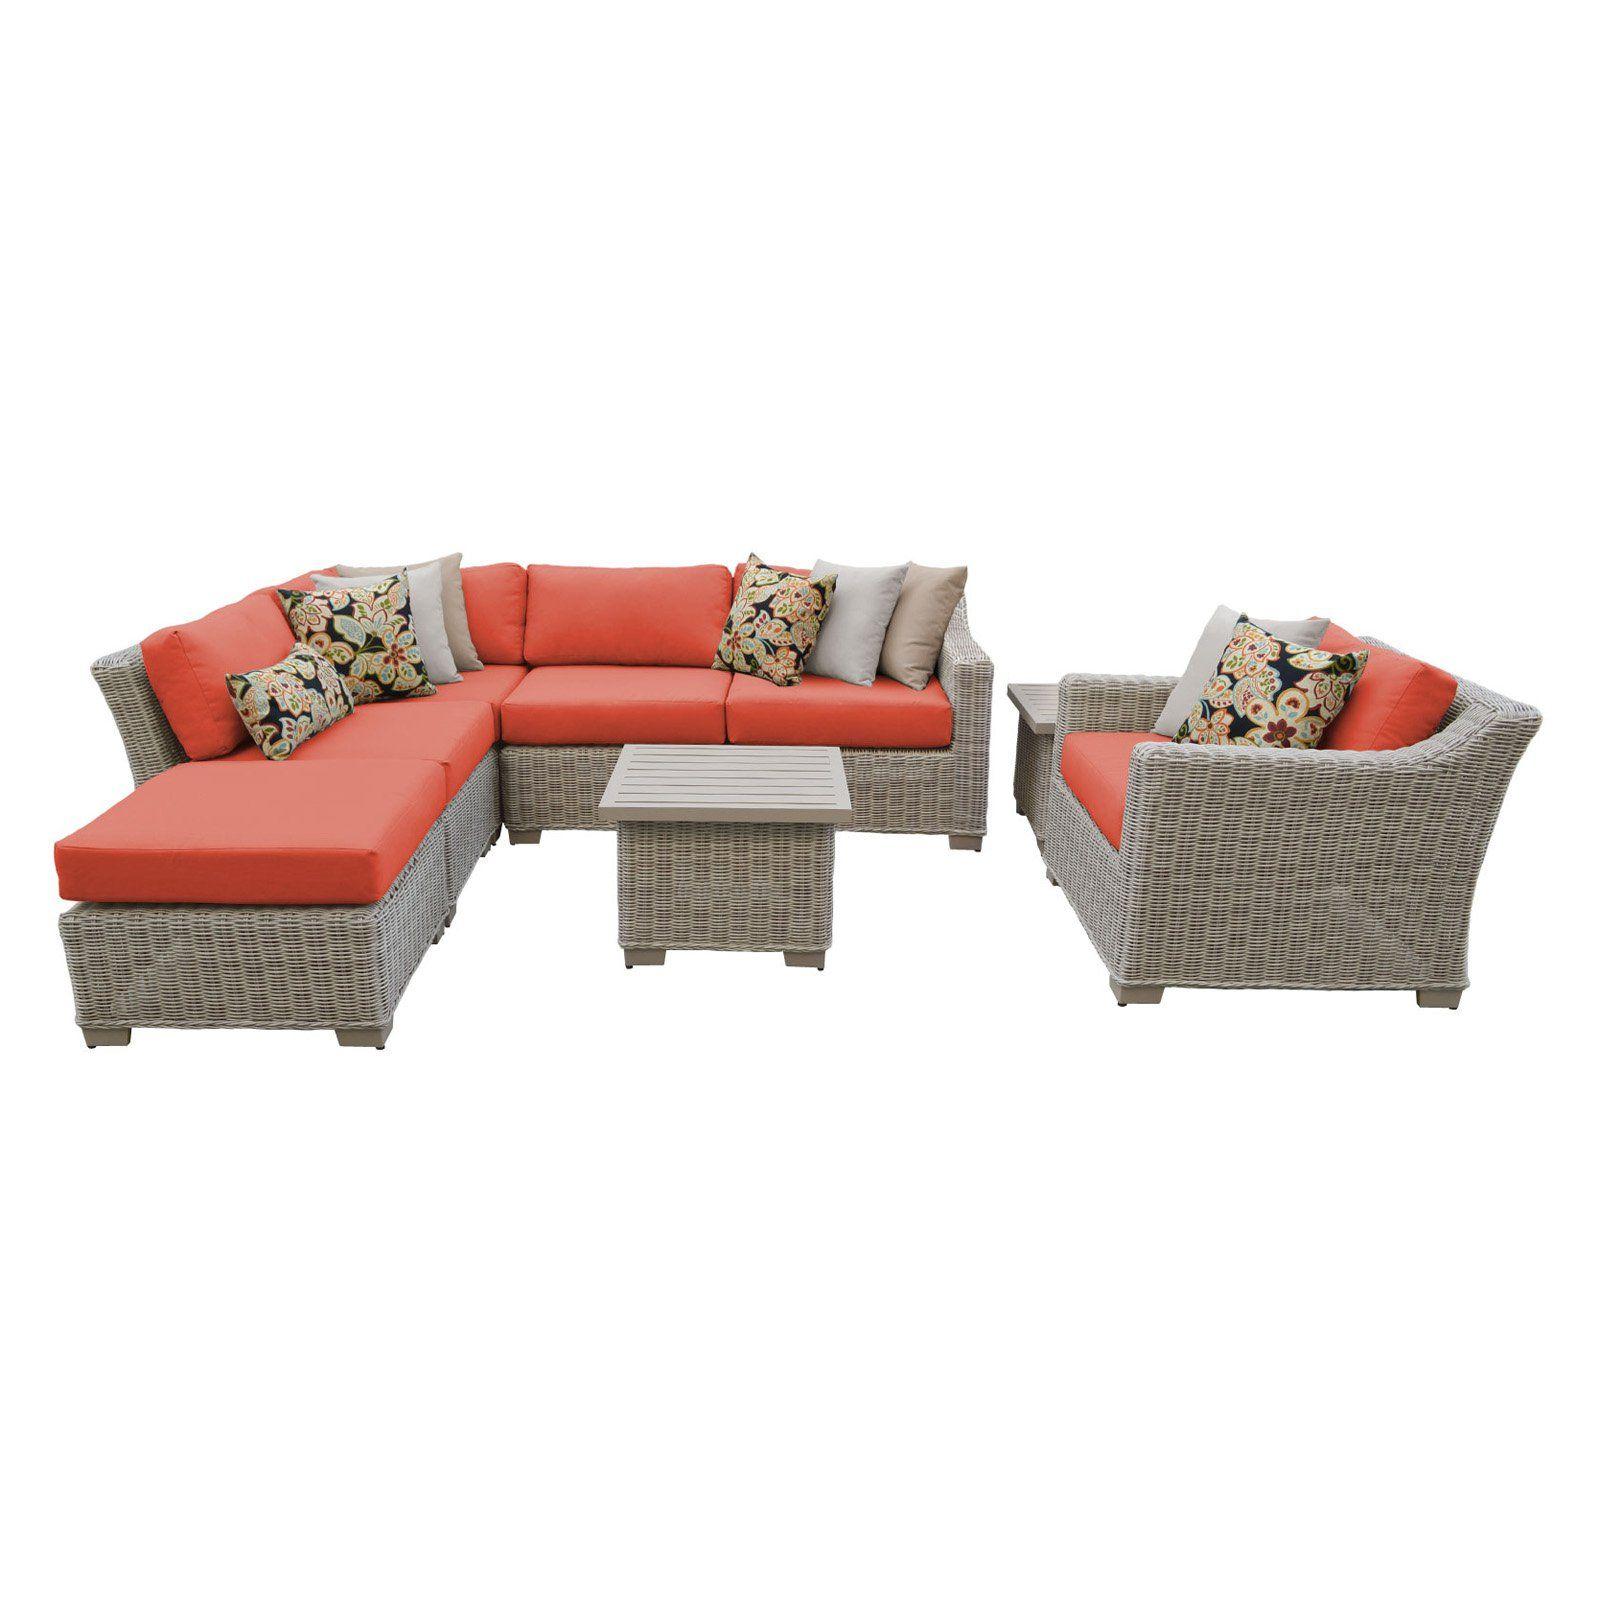 Outdoor Tk Classics Coast 8 Piece Wicker Patio Furniture Set With